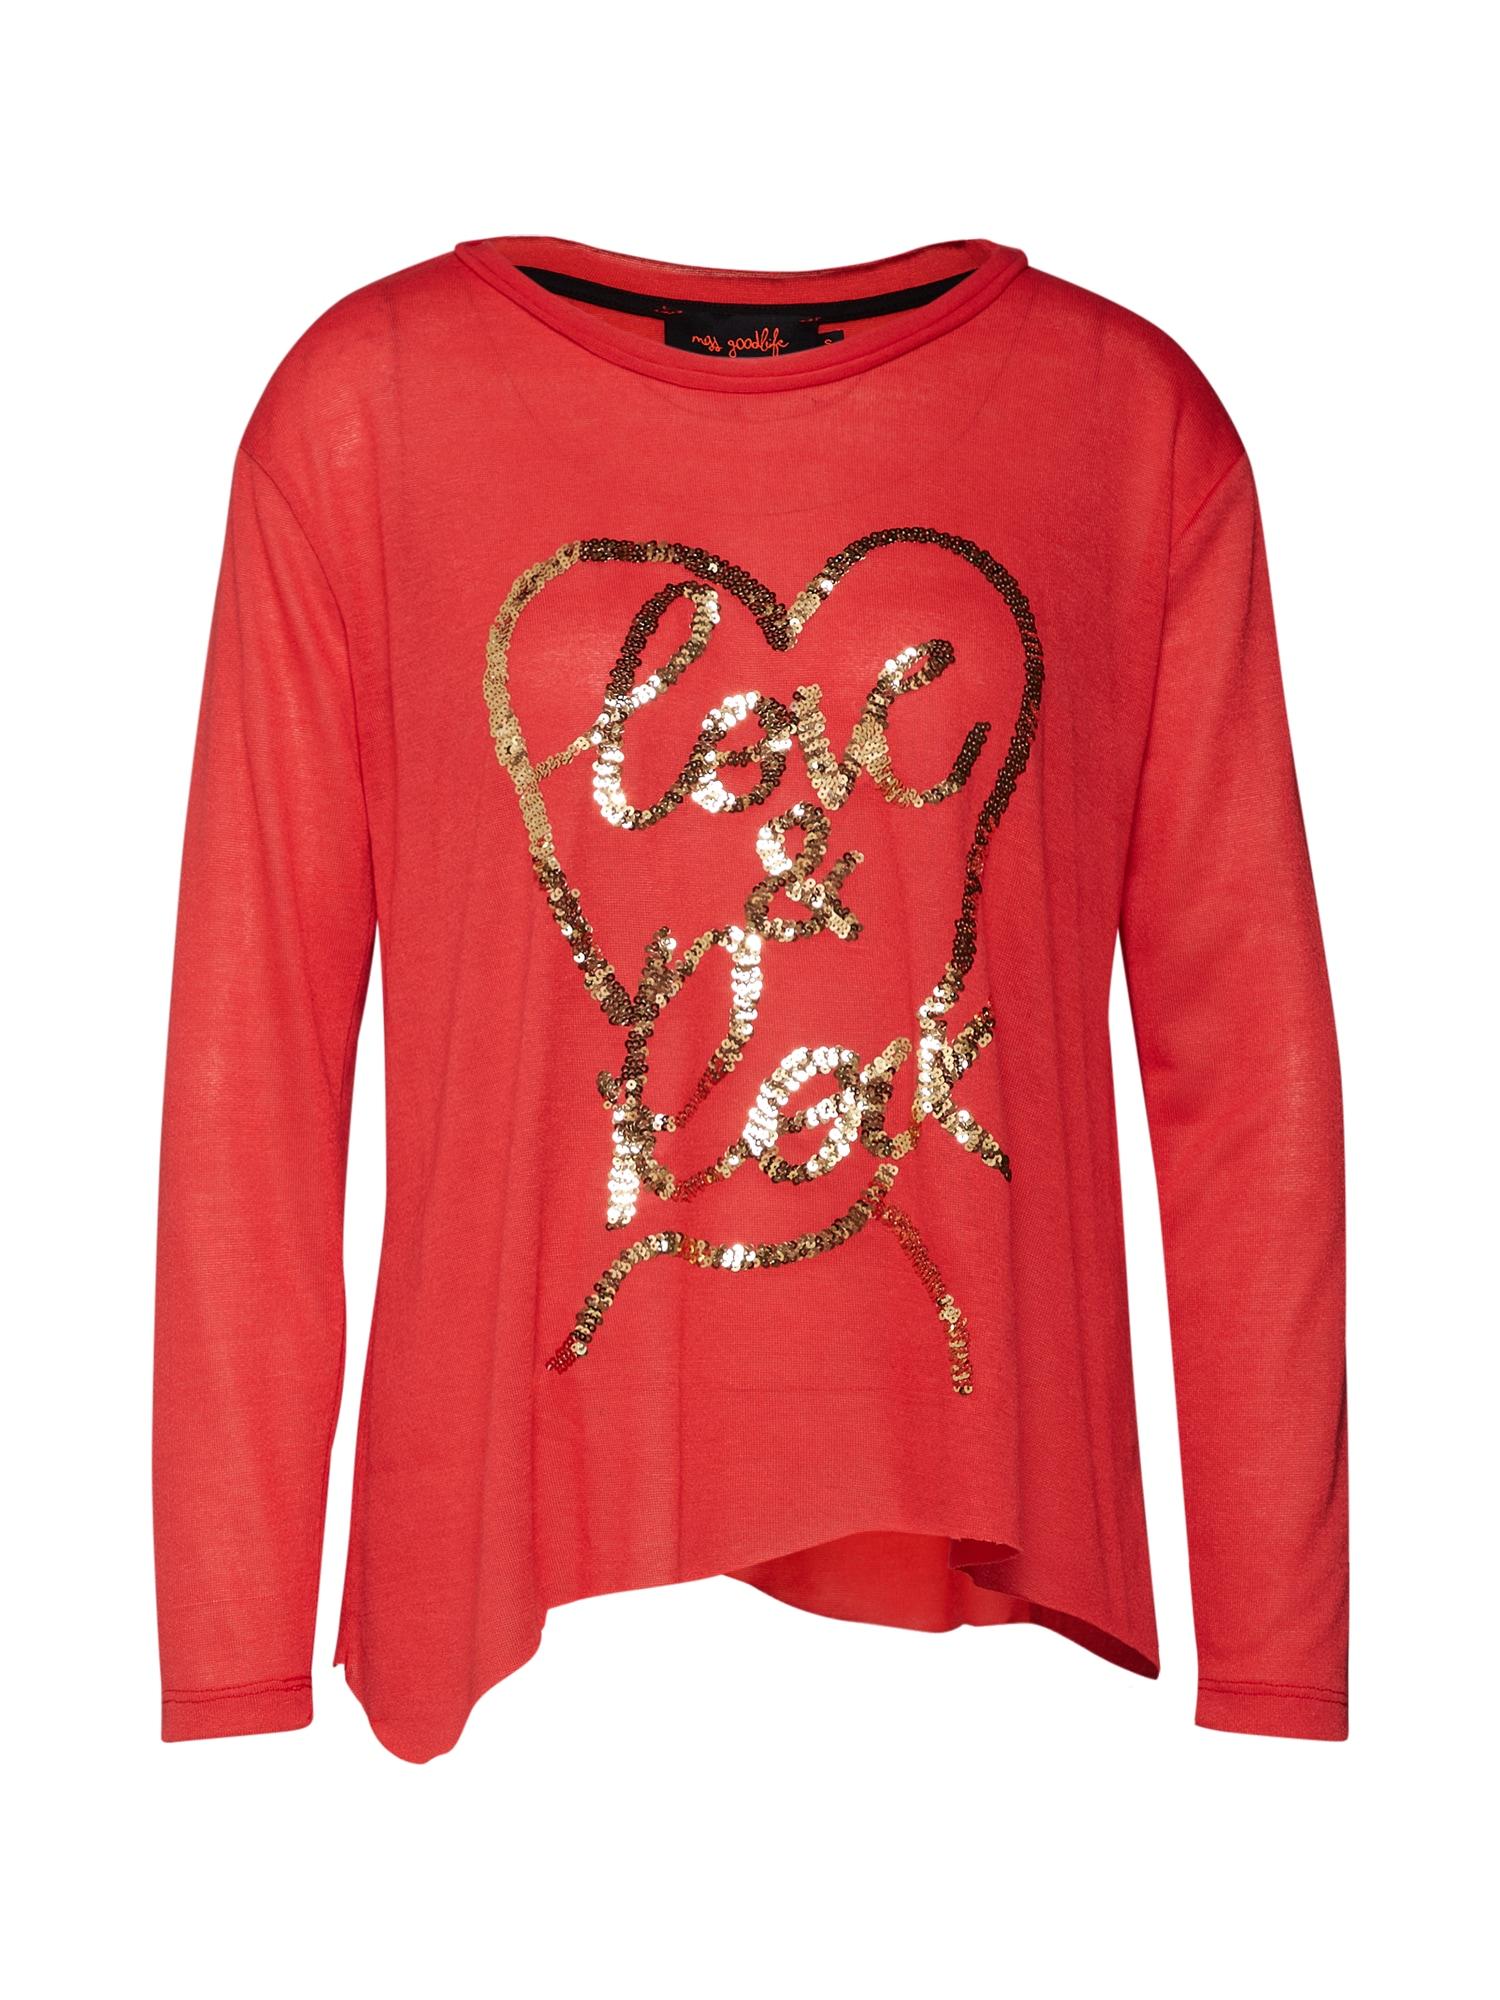 Tričko Love & Rock červená Miss Goodlife